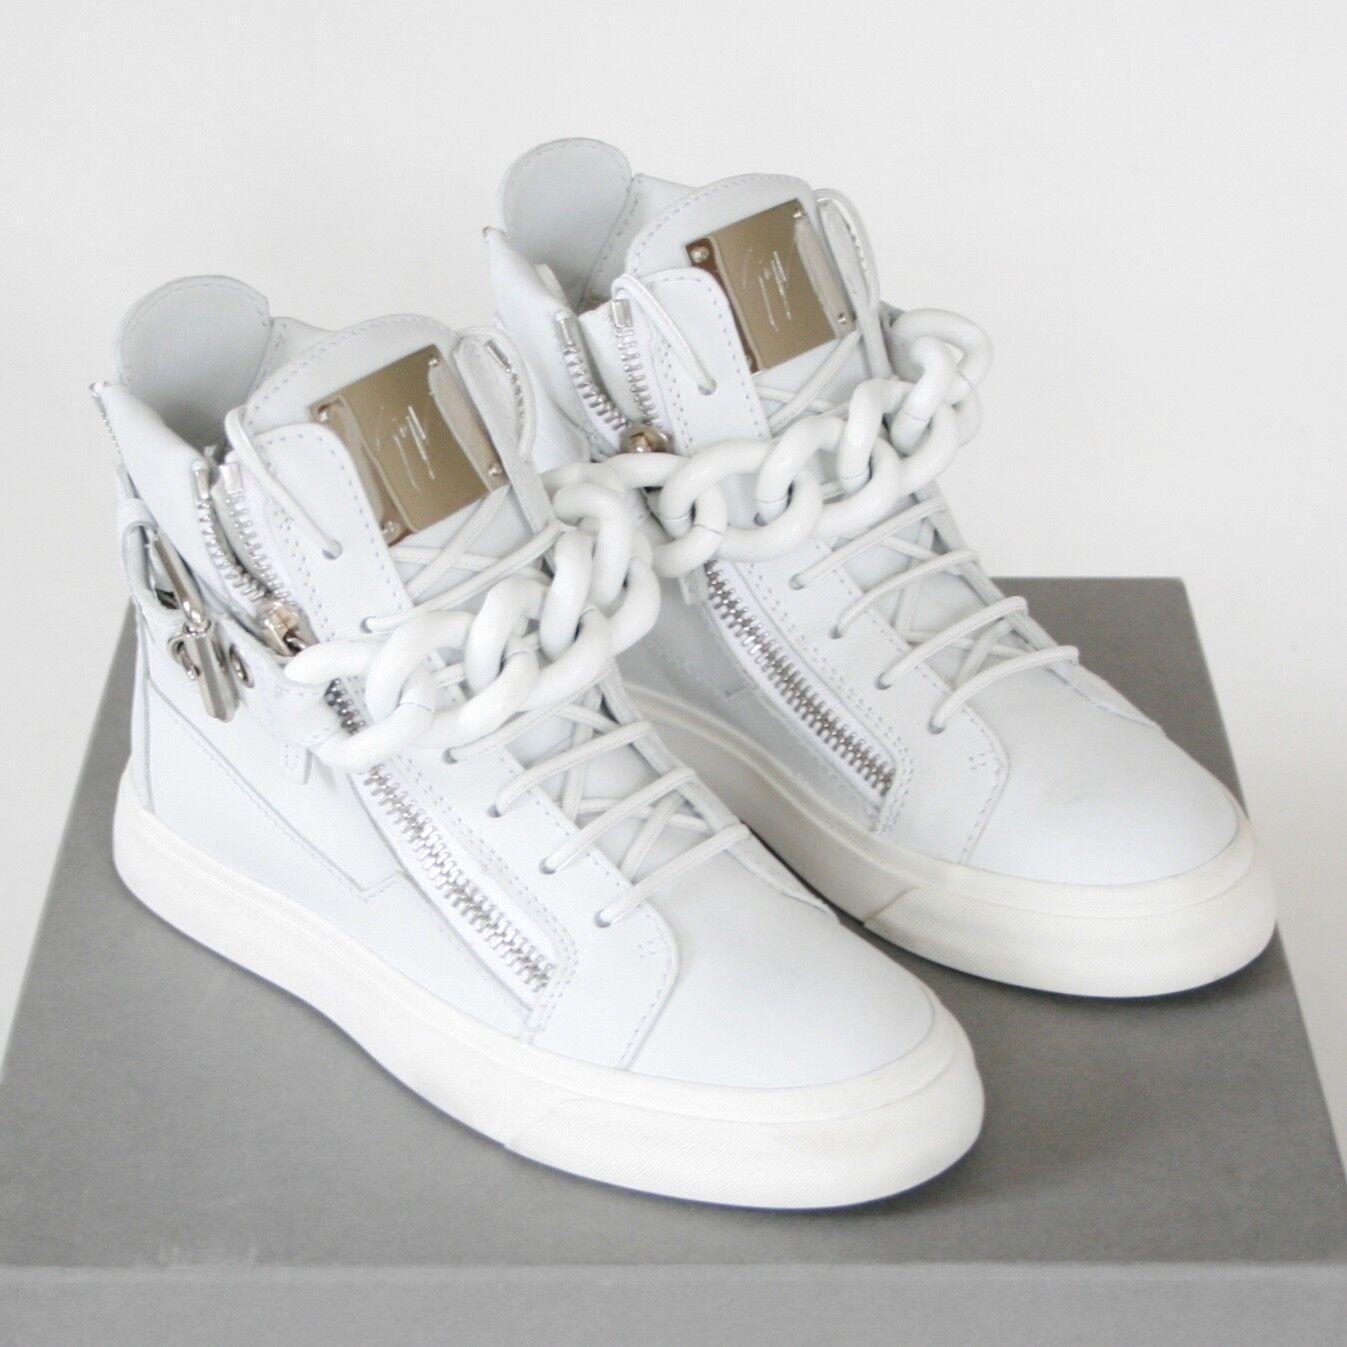 GIUSEPPE ZANOTTI off blanc leather chaussures birel chain hi top baskets 35 NEW